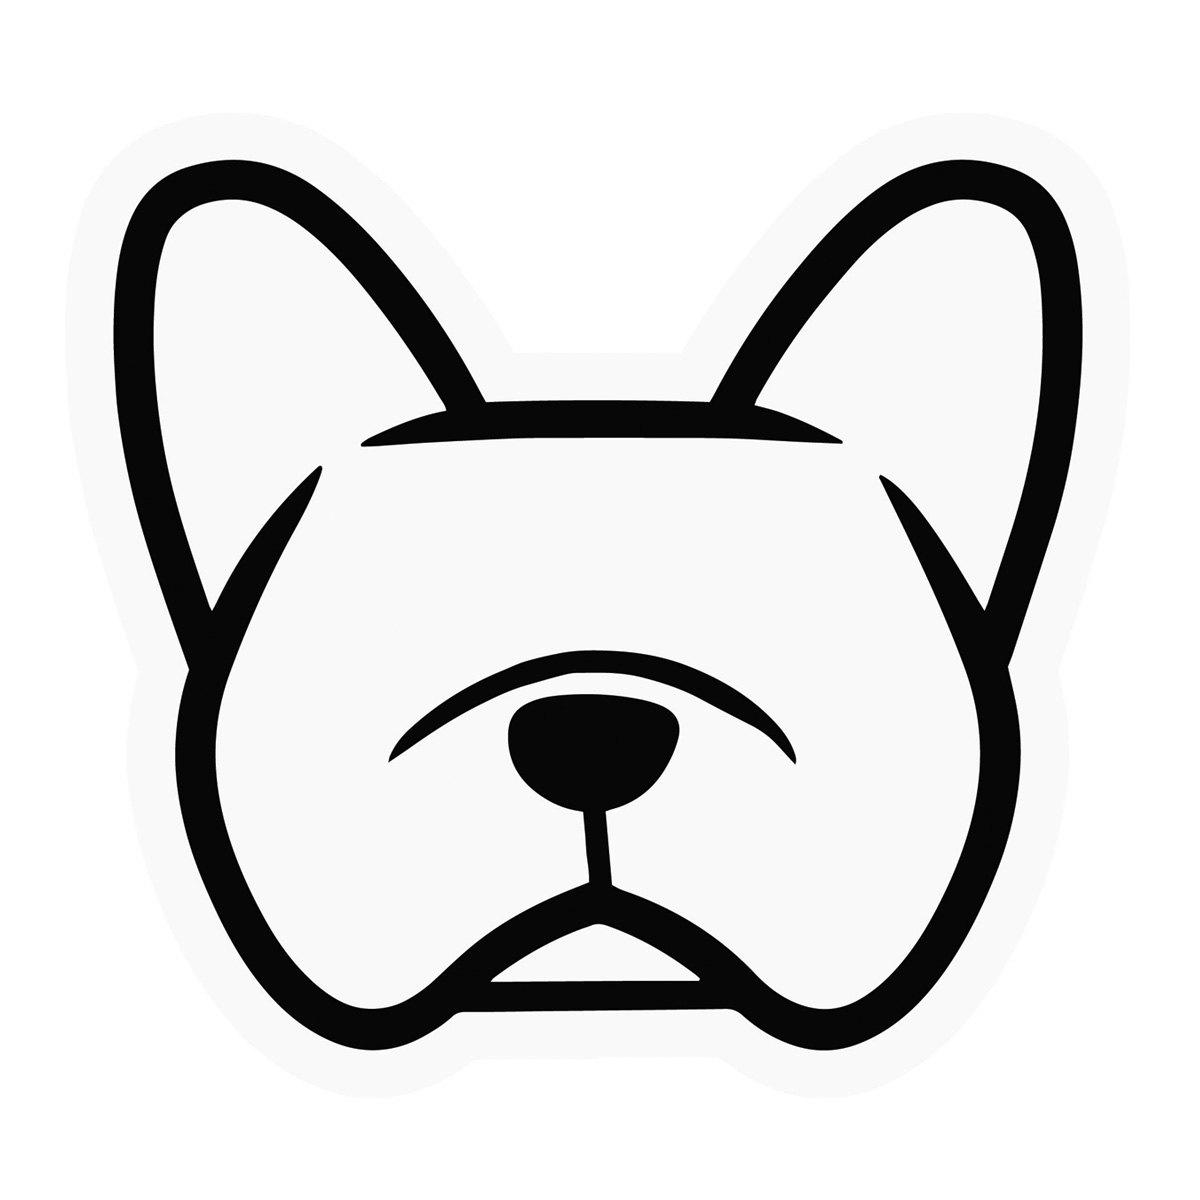 1200x1200 Httpswww.google.belank.html French Bulldog